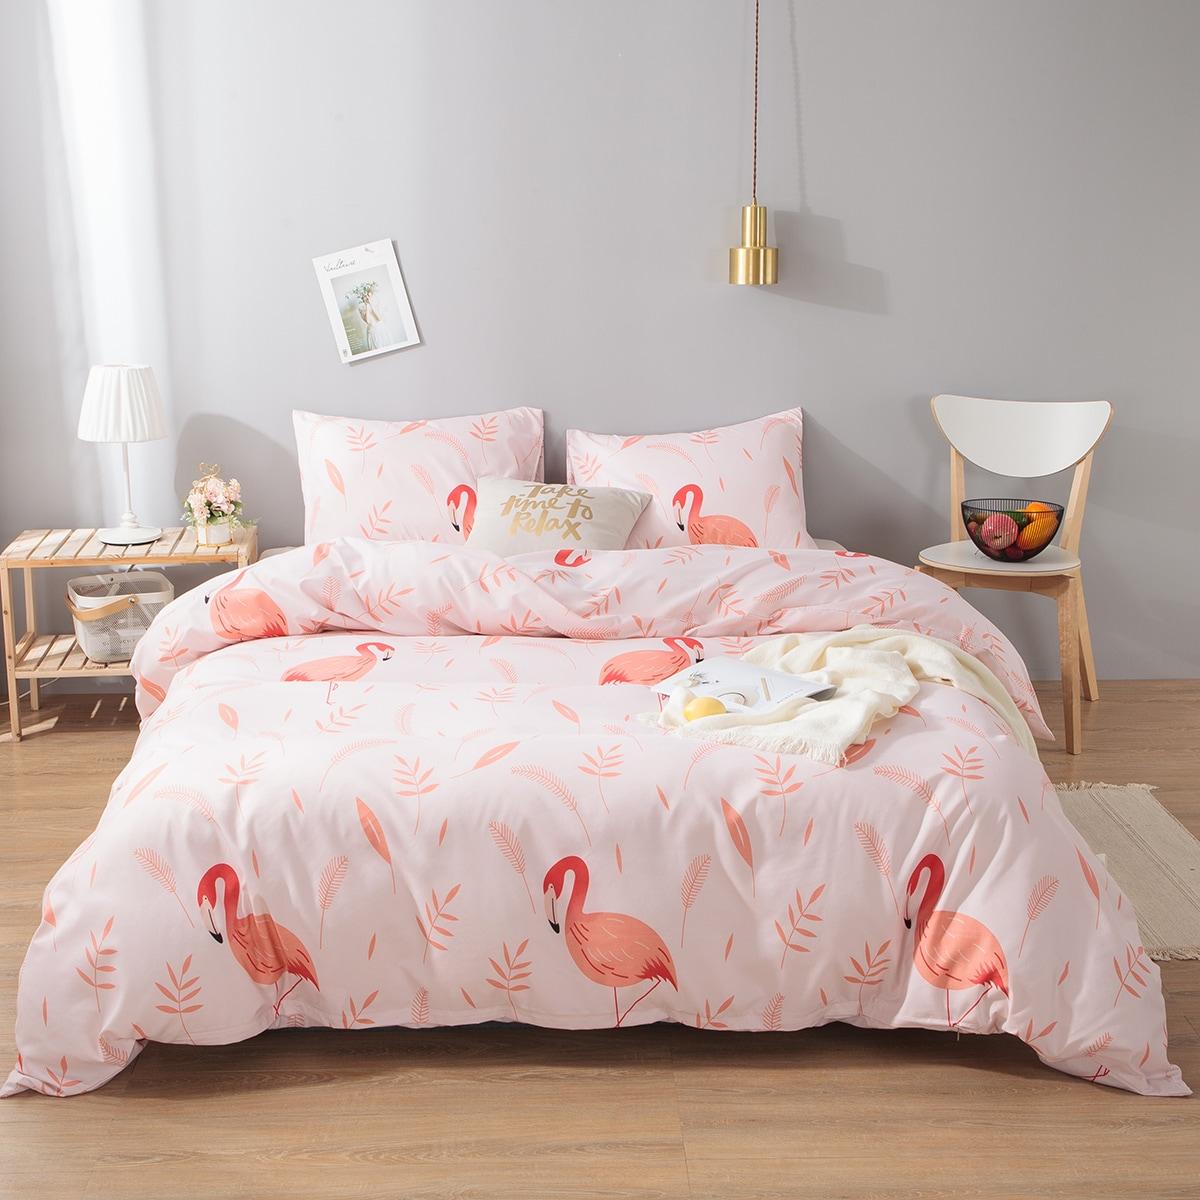 Flamingo patroon blad set